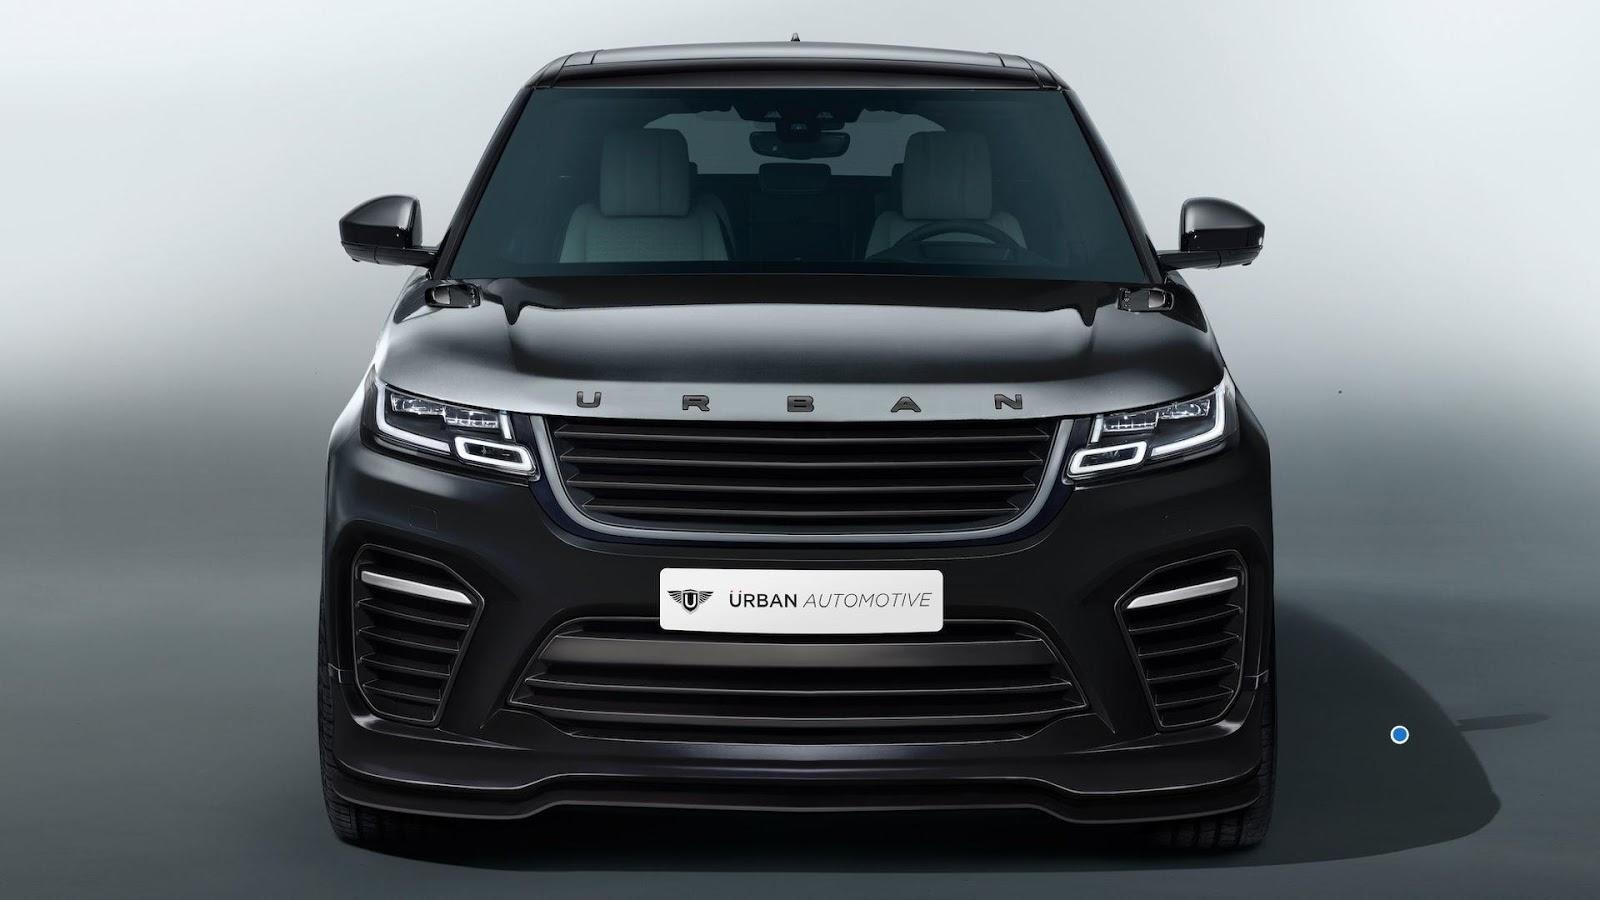 Range Rover Sport Svr 2018 >> Urban Automotive's Range Rover Velar Is Almost An SVR